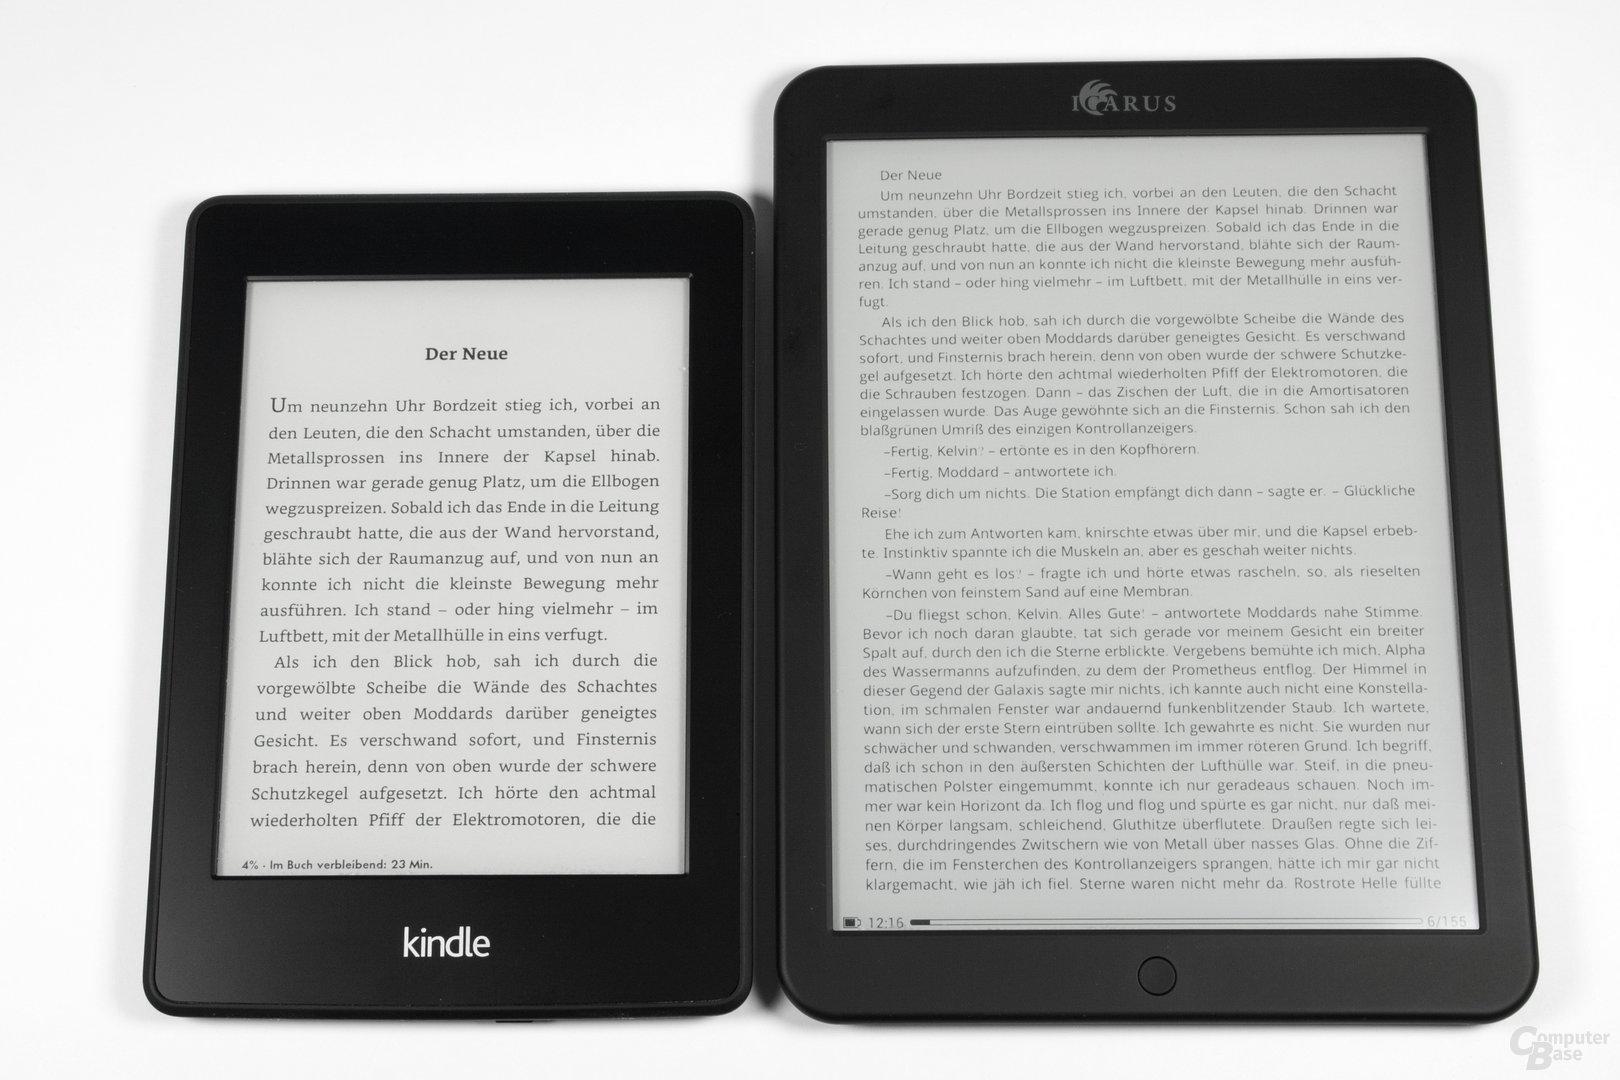 Schriftbildvergleich Kindle Paperwhite 2013 vs. Icarus Illumina XL (FB2 Reader)